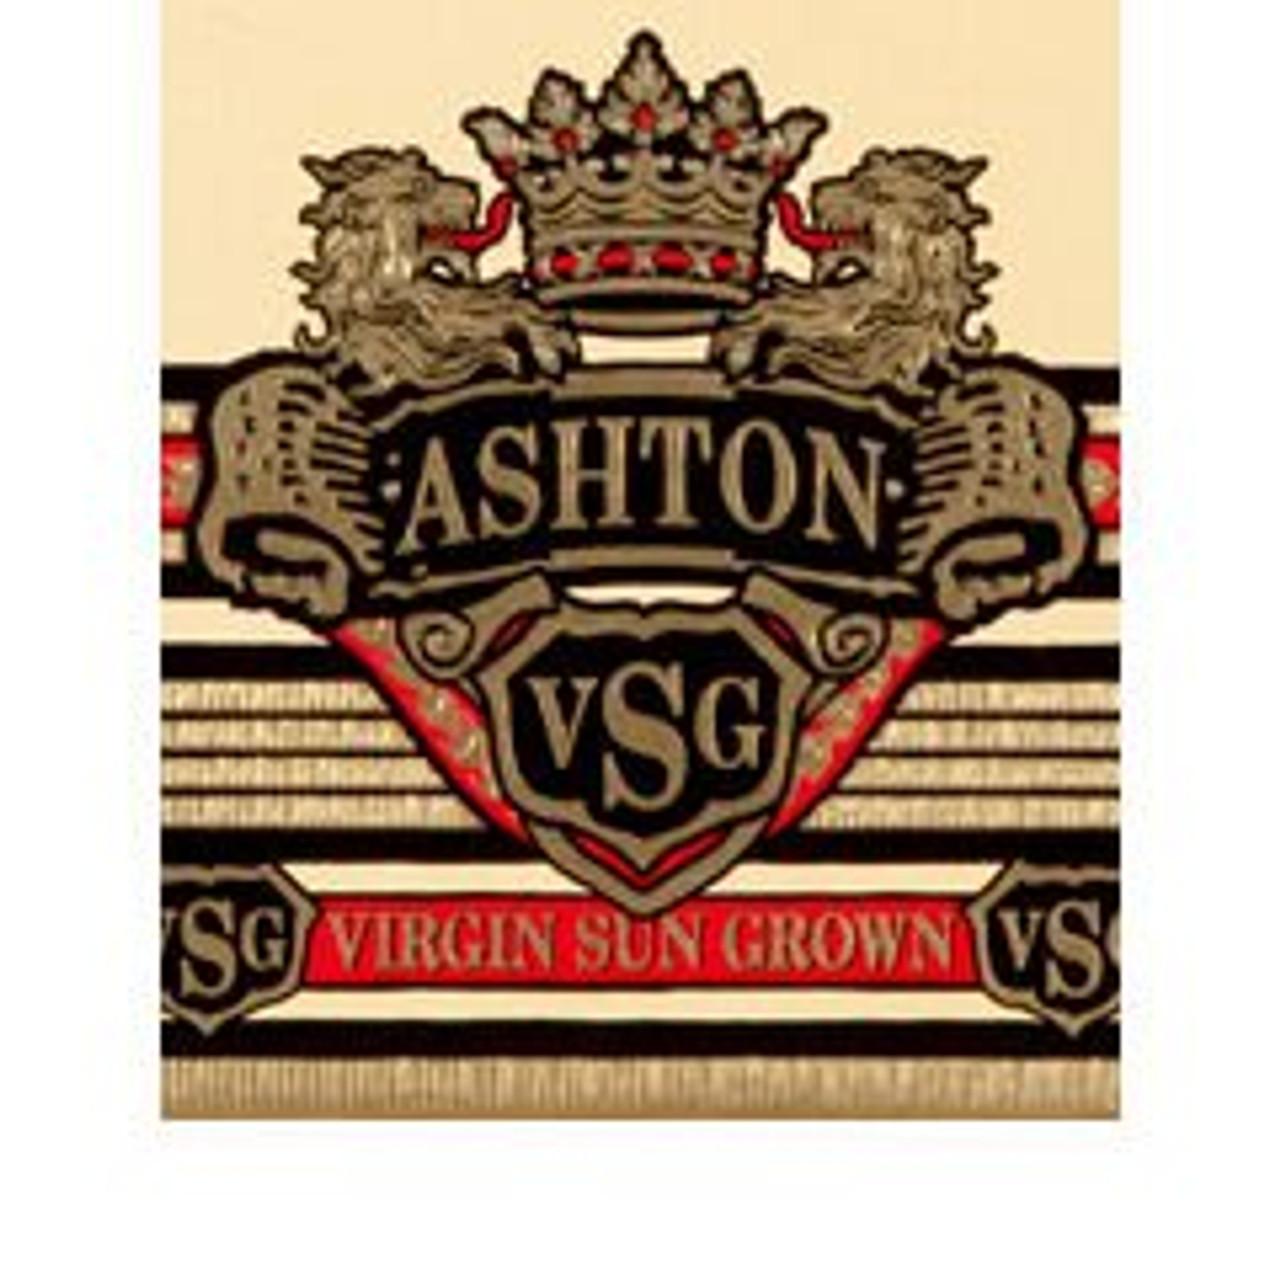 Ashton VSG Spellbound Cigars - 7.5 x 54 (Cedar Chest of 24)